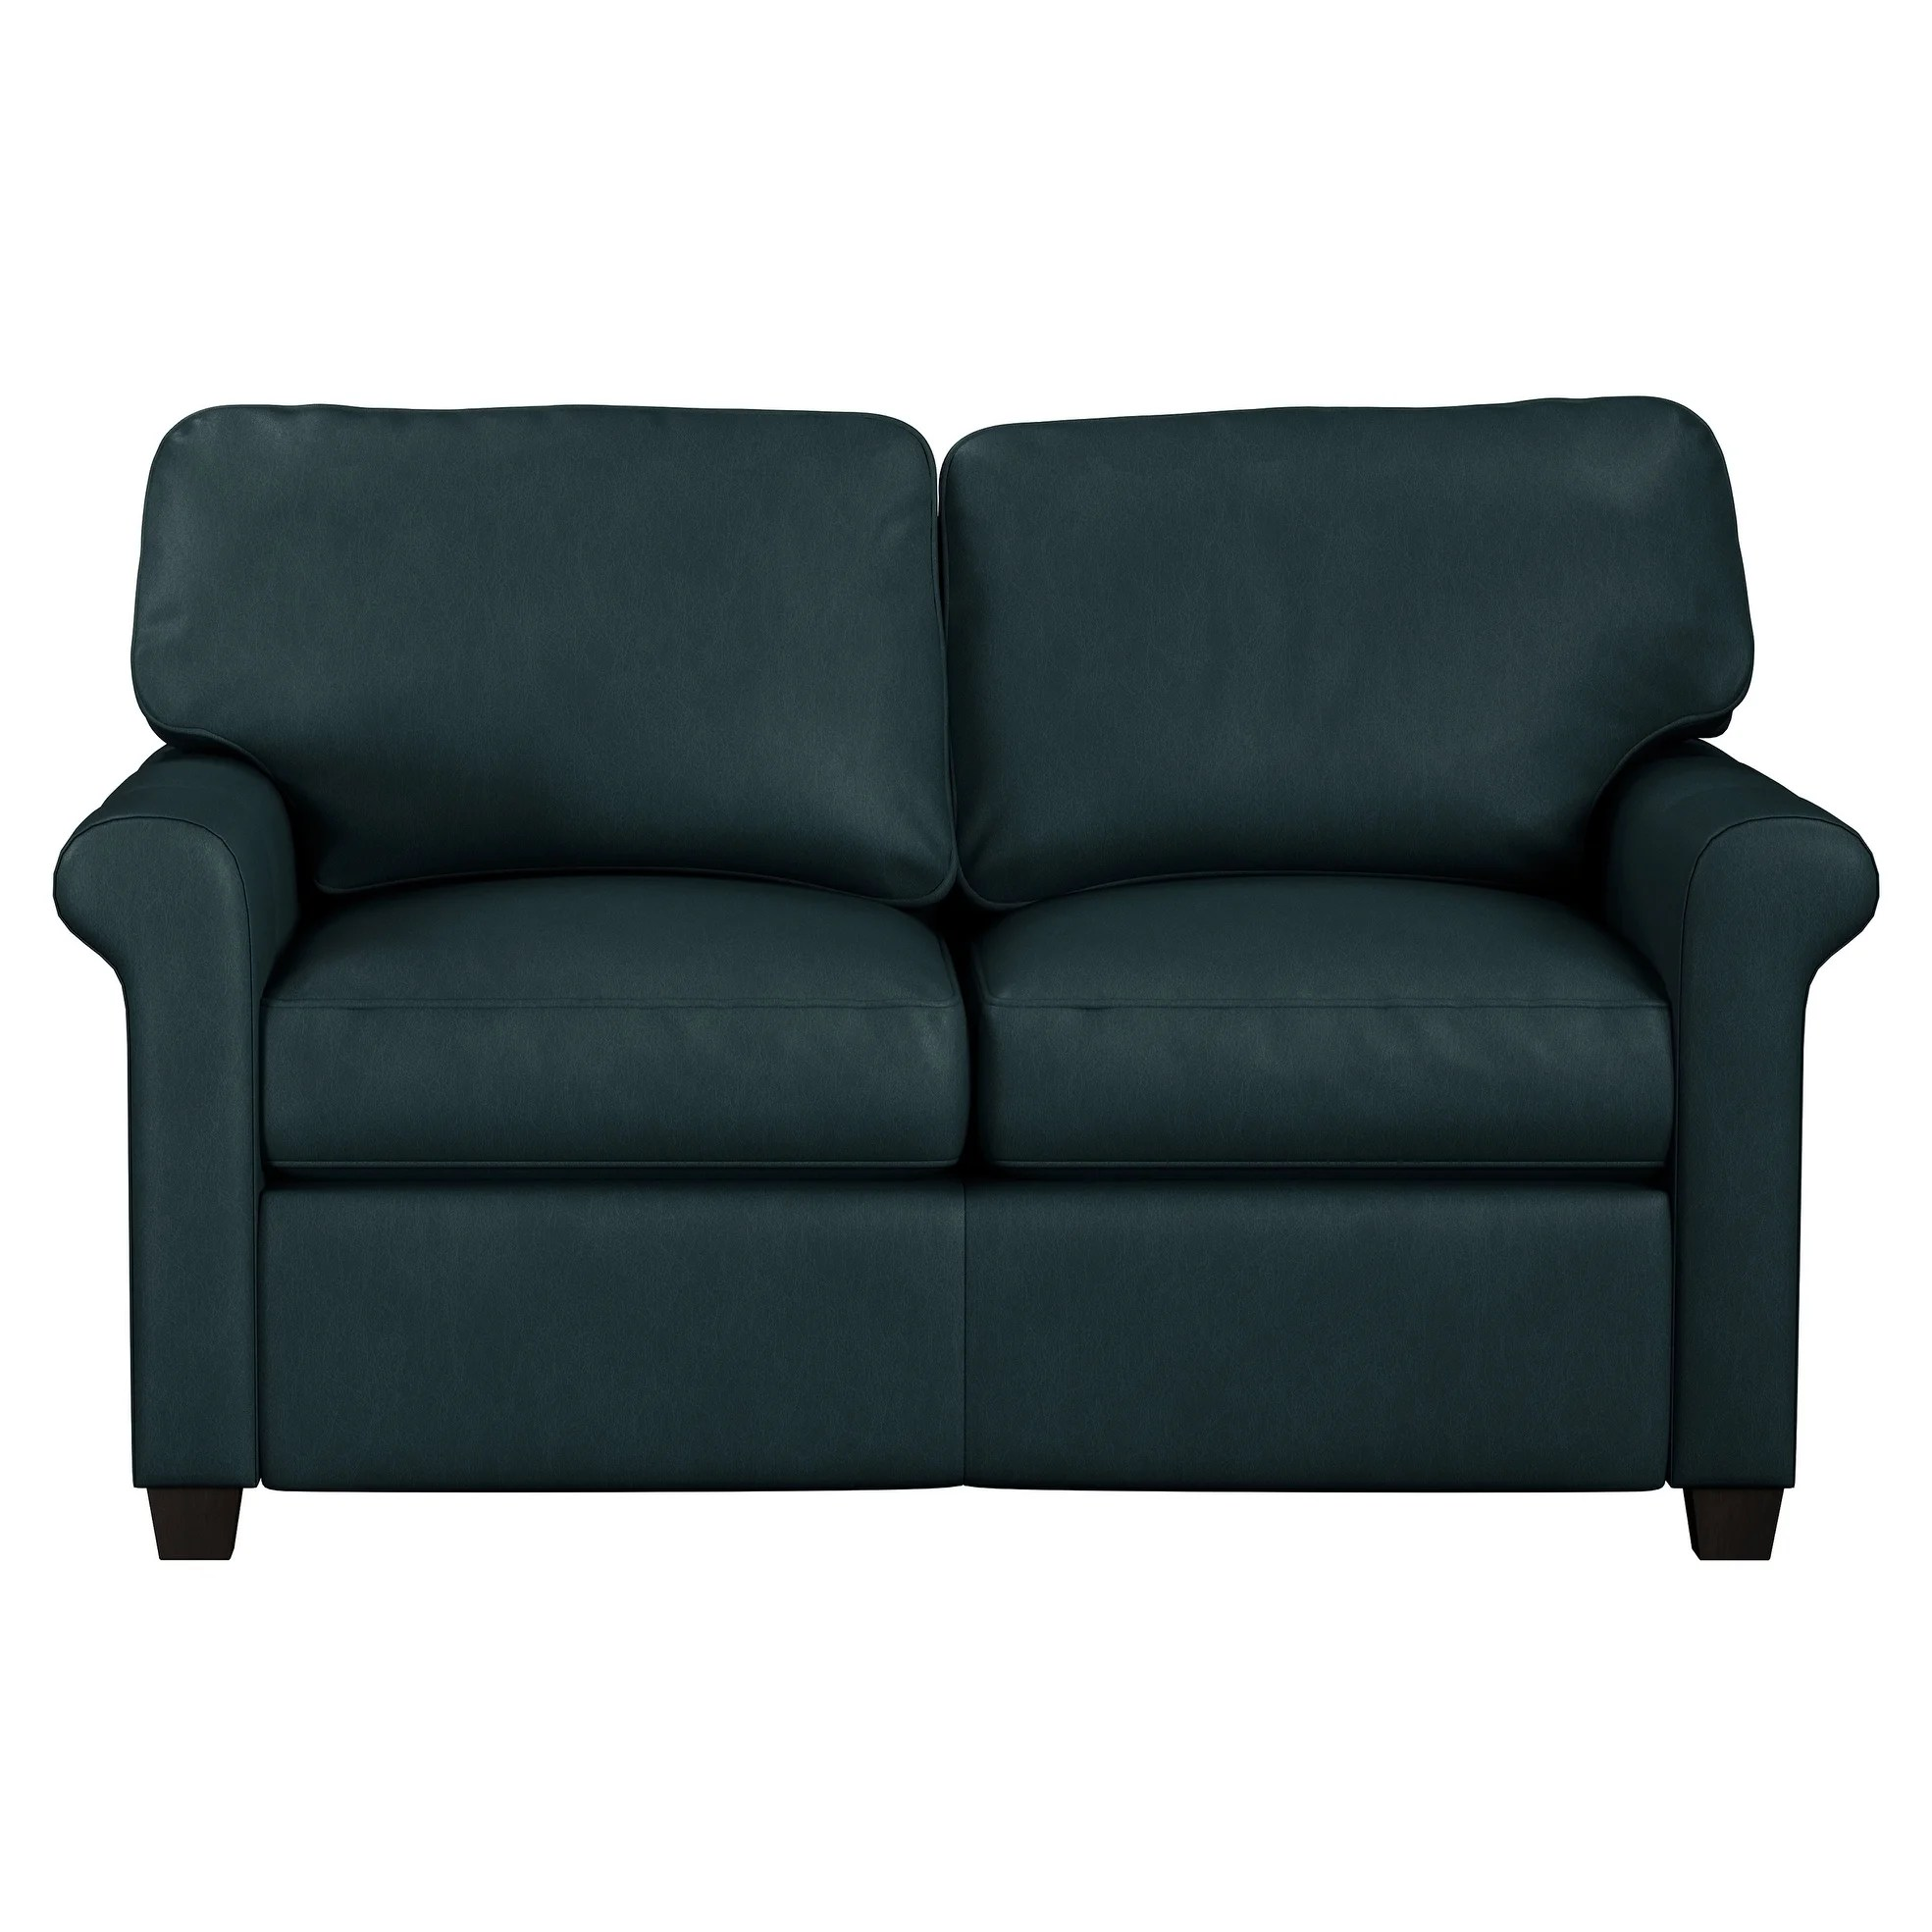 Made To Order Asti Genuine Top Grain Leather Twin Sleeper Sofa On Sale Overstock 23620559